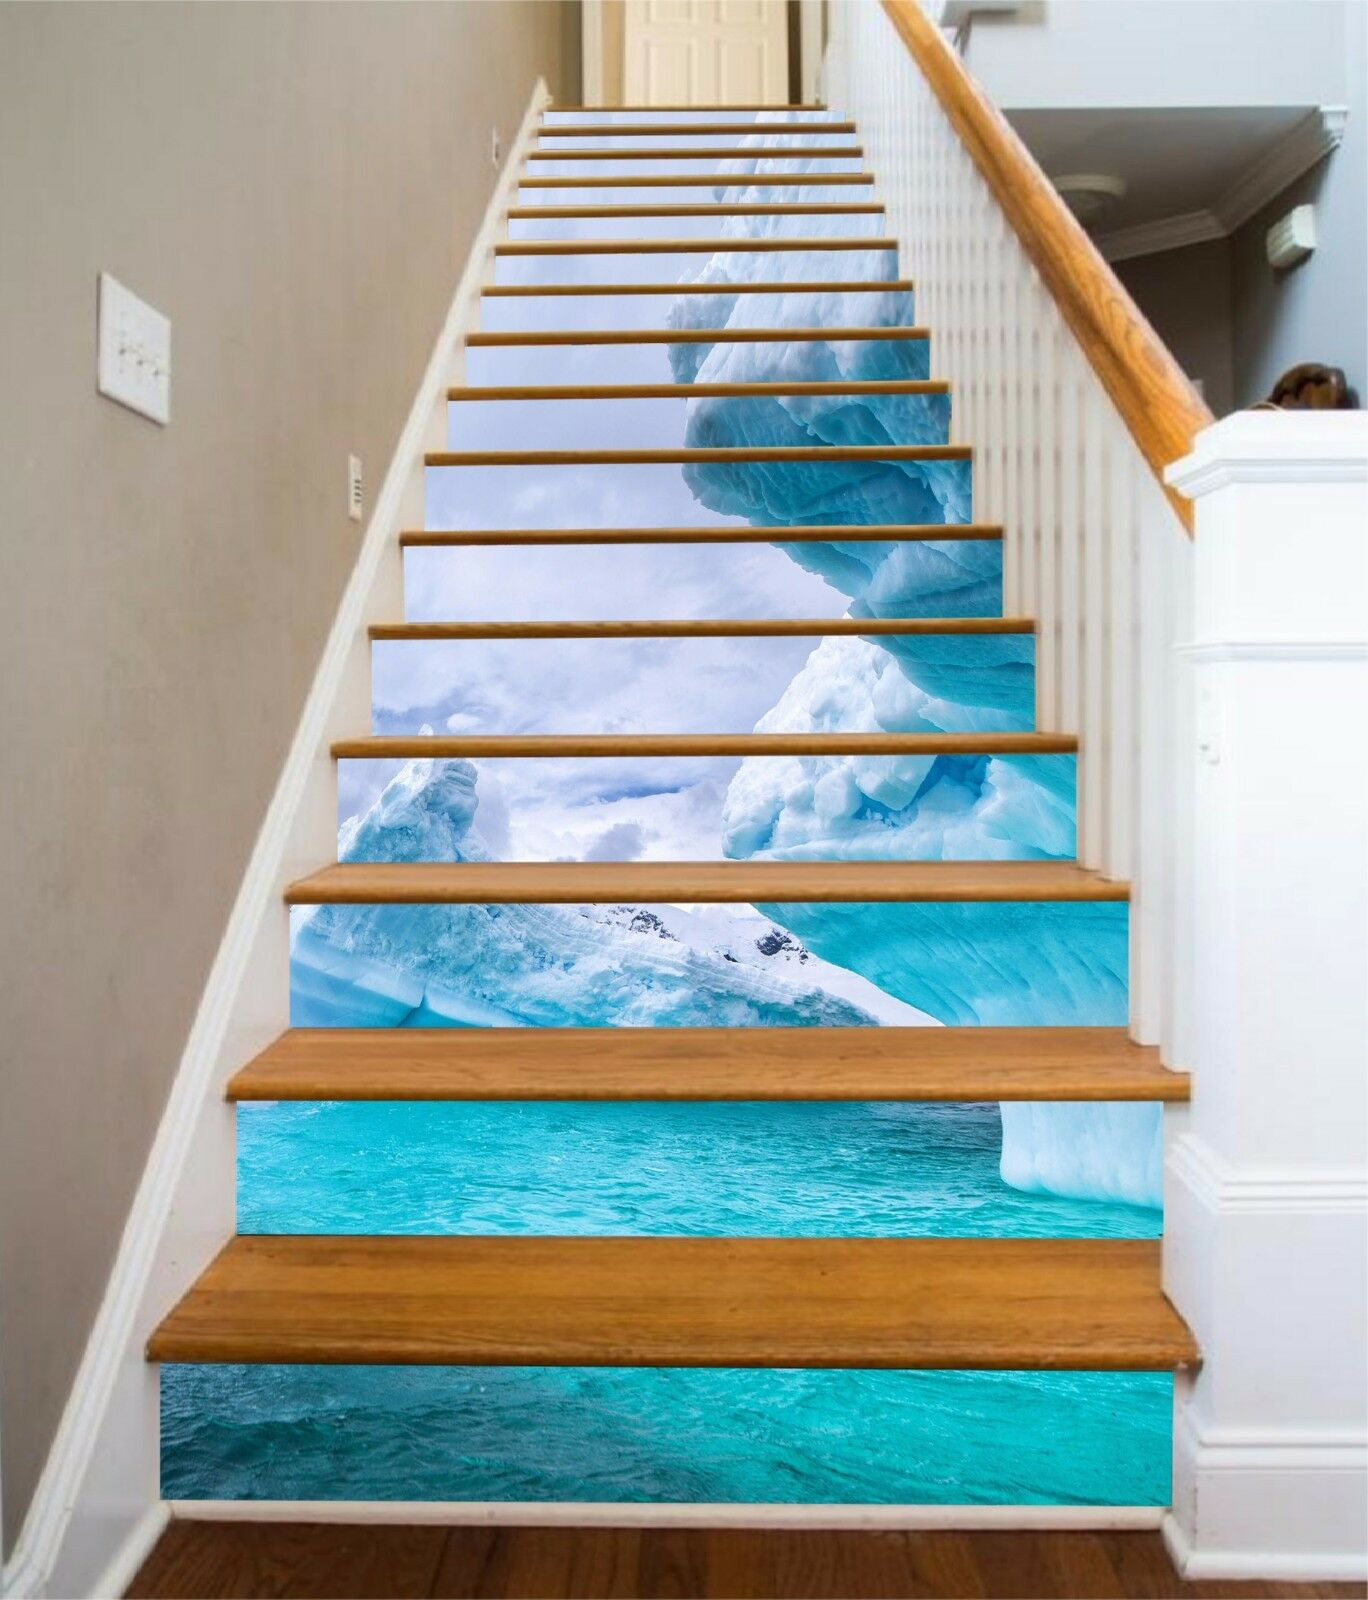 3D Sky wave 7 Stair Risers Decoration Photo Mural Vinyl Decal Wallpaper UK